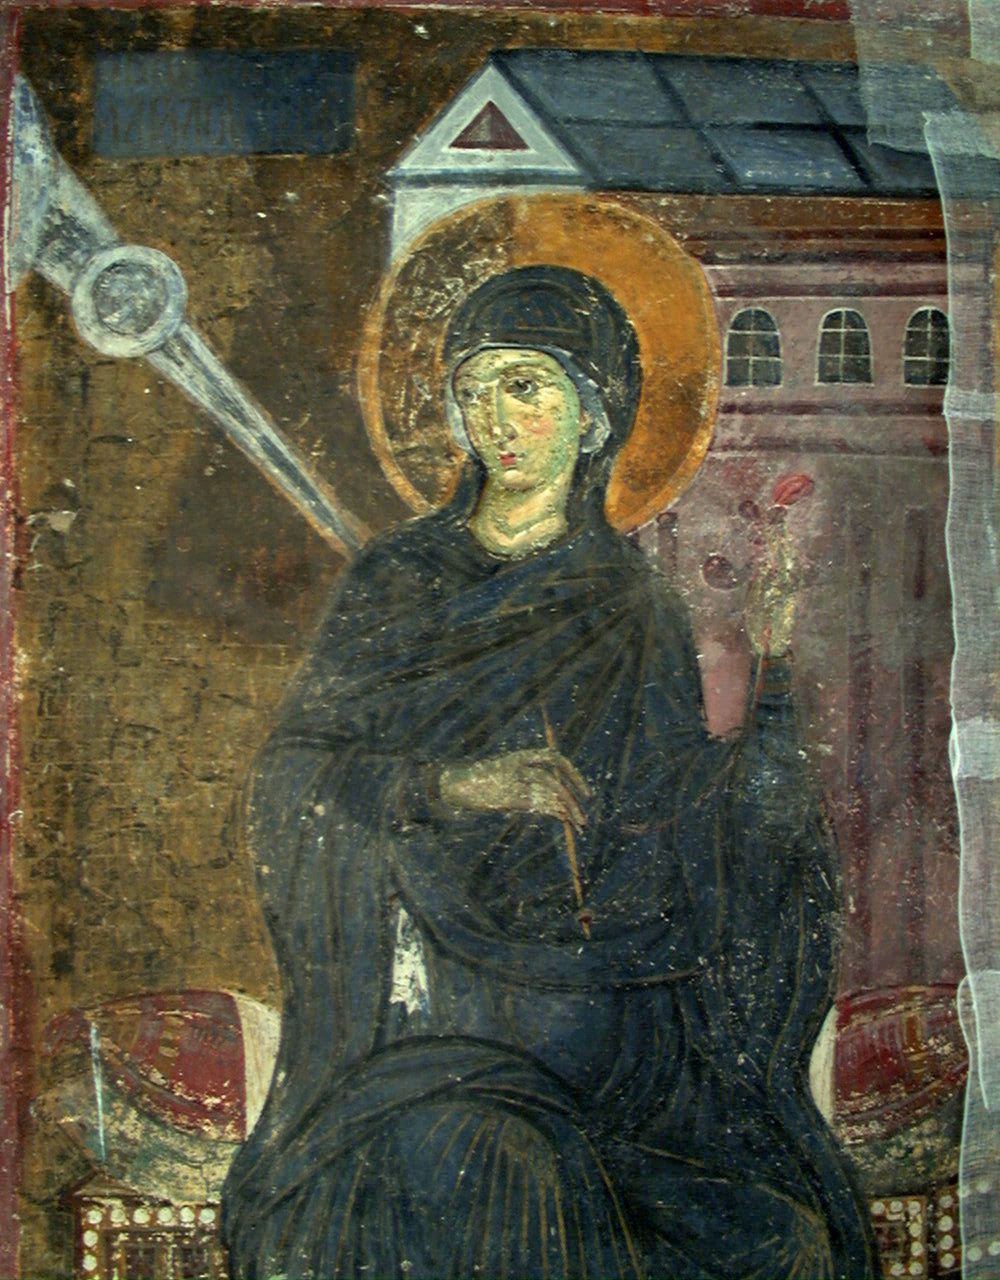 Spinning Virgin Mary, 1235, a fresco in the Serbian monastery of Mileševa.  http://www.monumentaserbica.com/mushushu/story.php?id=11